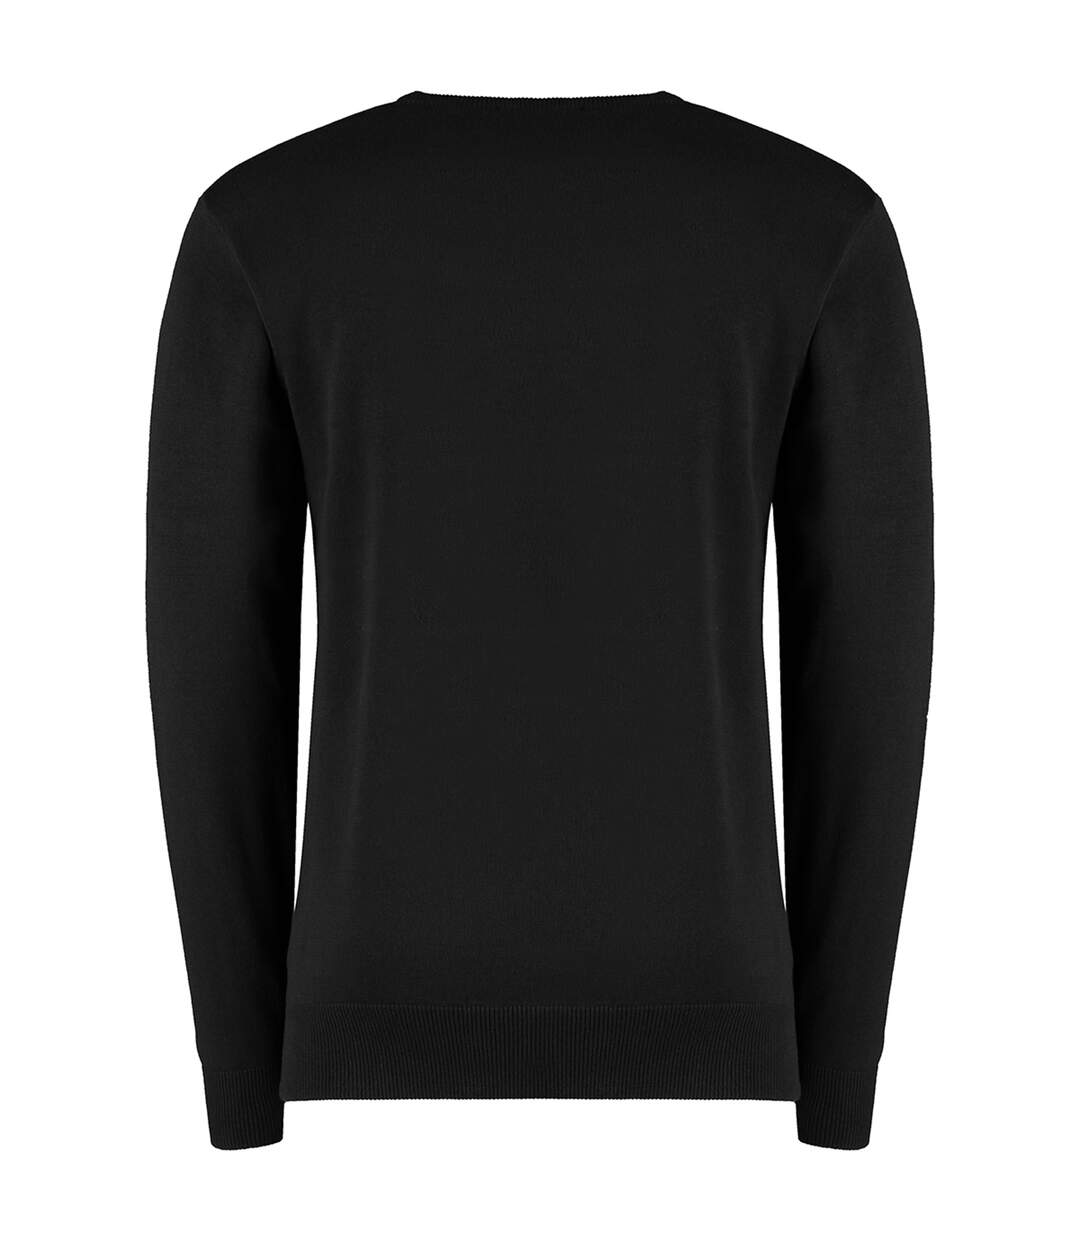 Kustom Kit Mens Arundel Crew Neck Sweater (Black) - UTPC3840